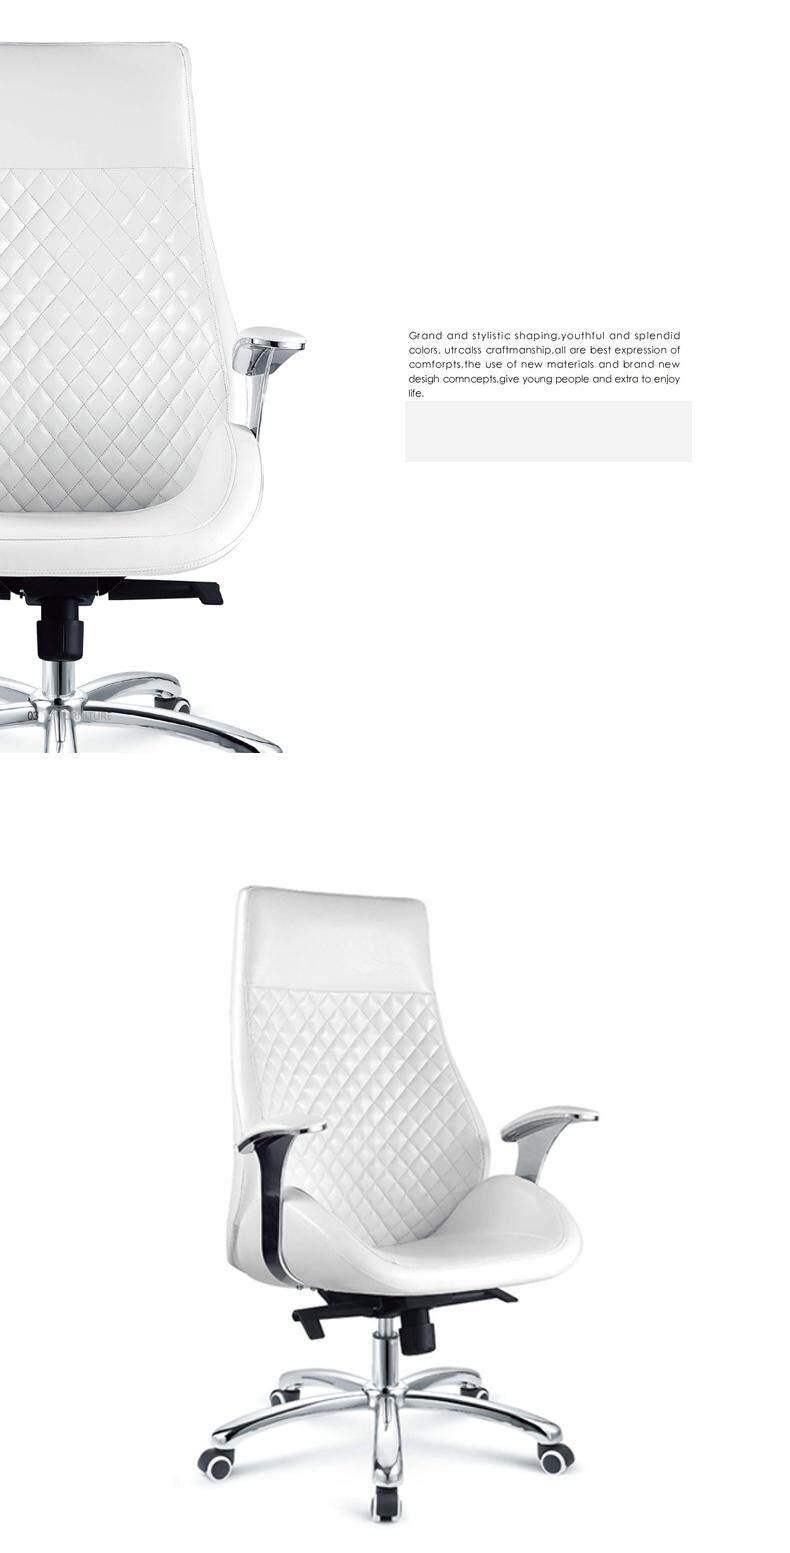 office chair materials. 2.jpg Office Chair Materials